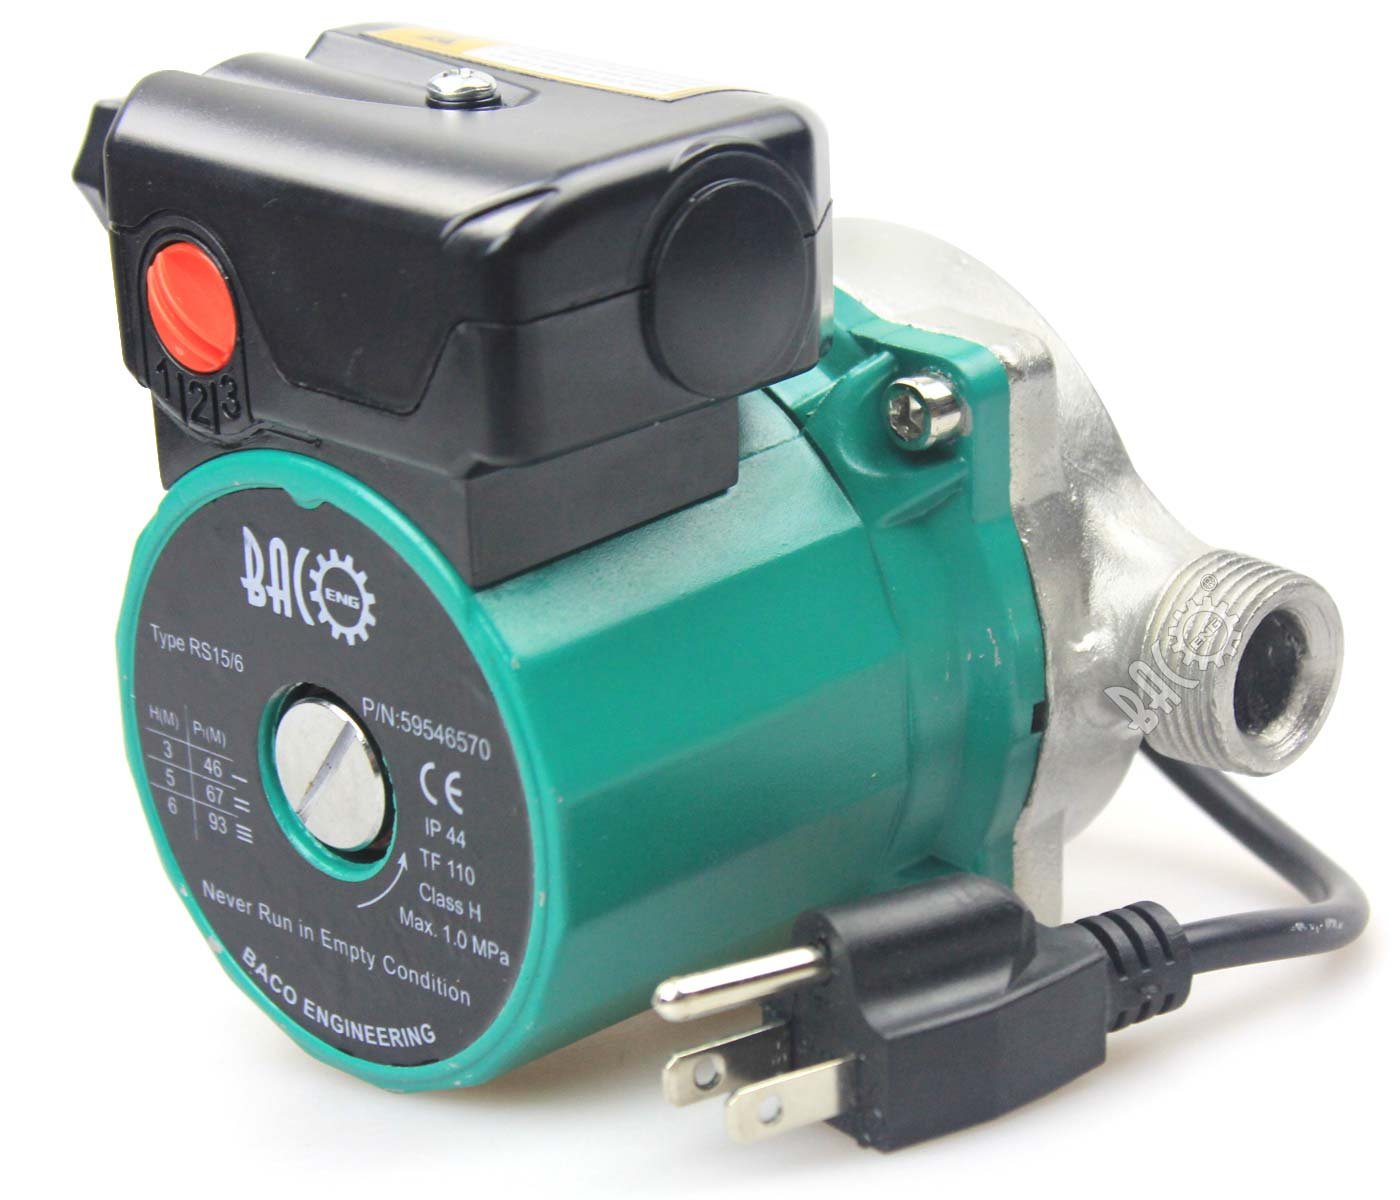 BACOENG 3/4'' 110V NPT Hot Water Circulation Pump Circulating Pump For Solar Heater Circulator US Plug